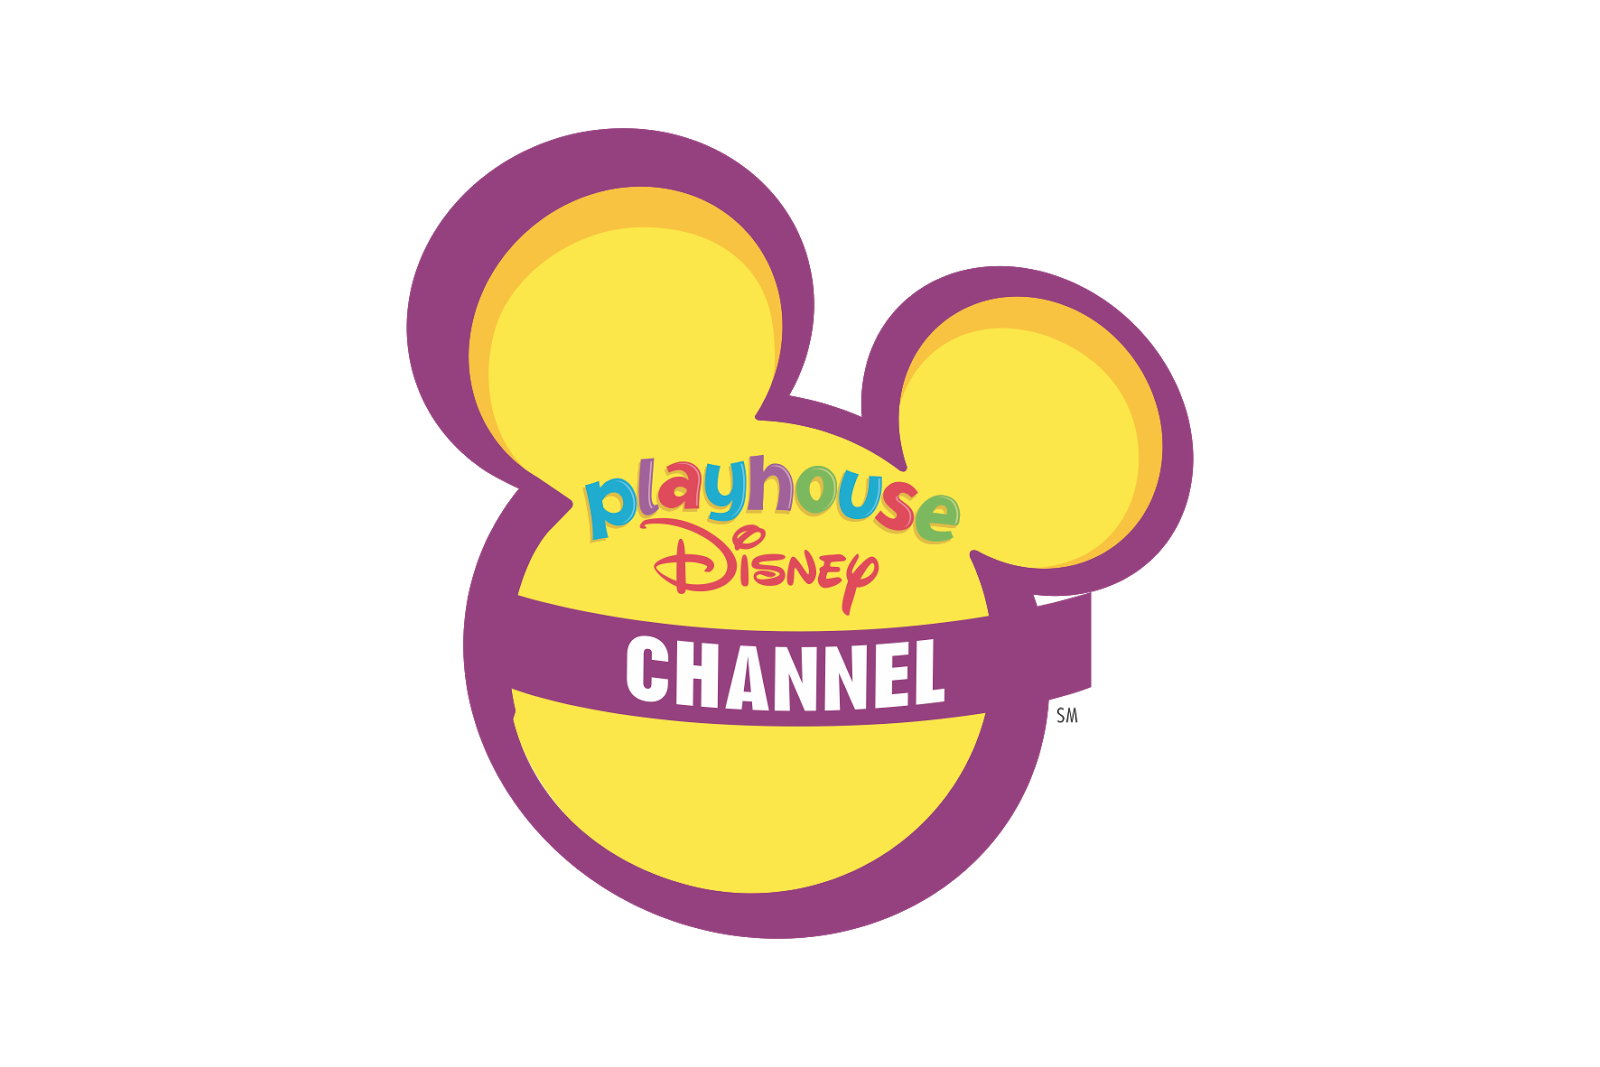 playhouse disney channel logo logoshare